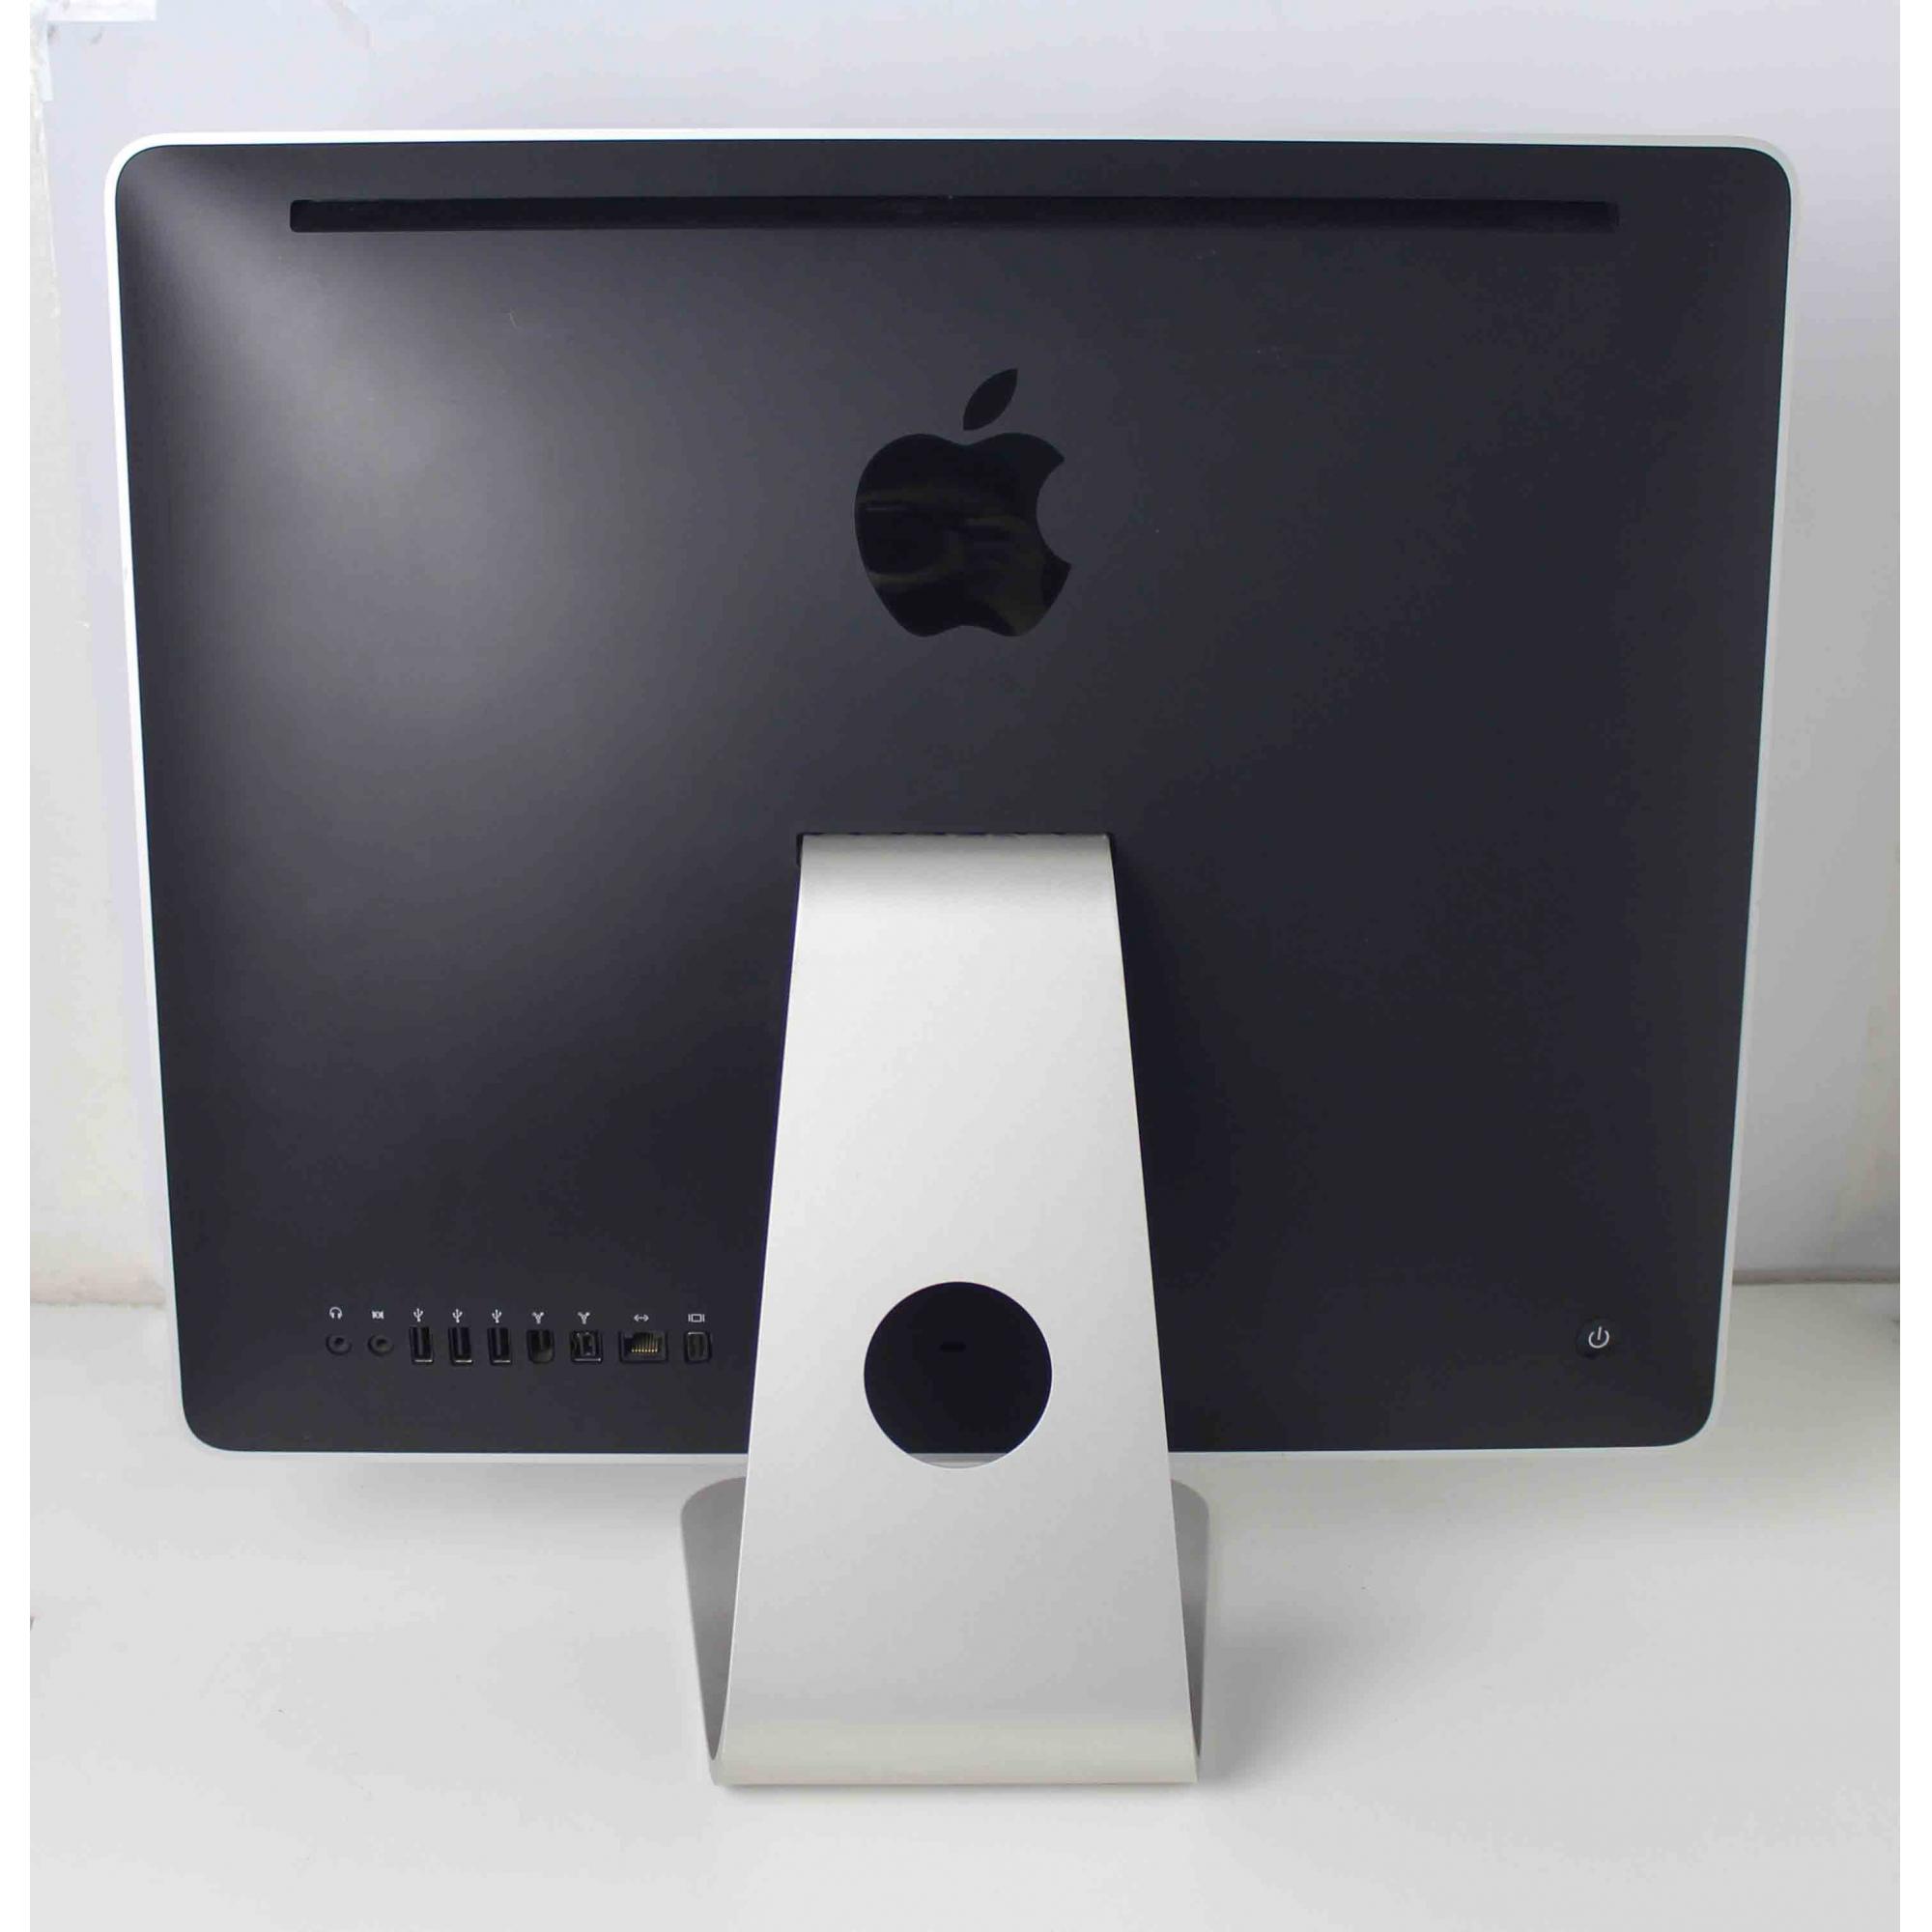 "iMac MB323LL/A 20"" Intel Core 2 Duo 2.4GHz 4GB HD-320GB (Não enviamos)"